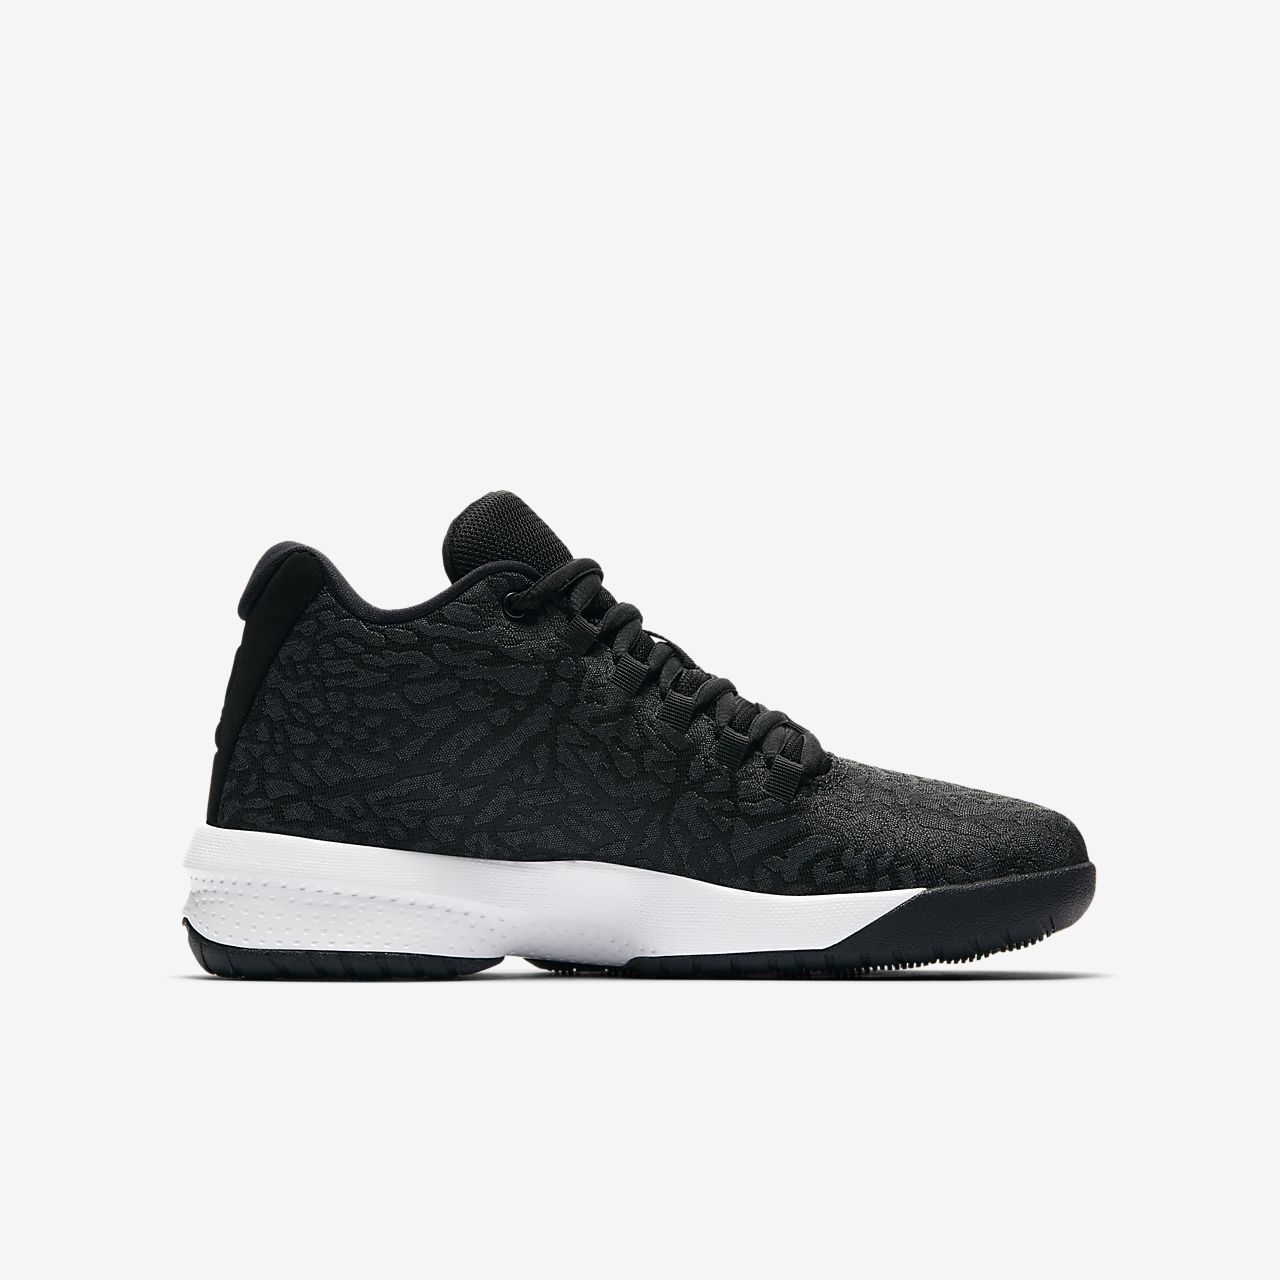 promo code 99232 e8c02 ... Jordan B. Fly Older Kids Basketball Shoe